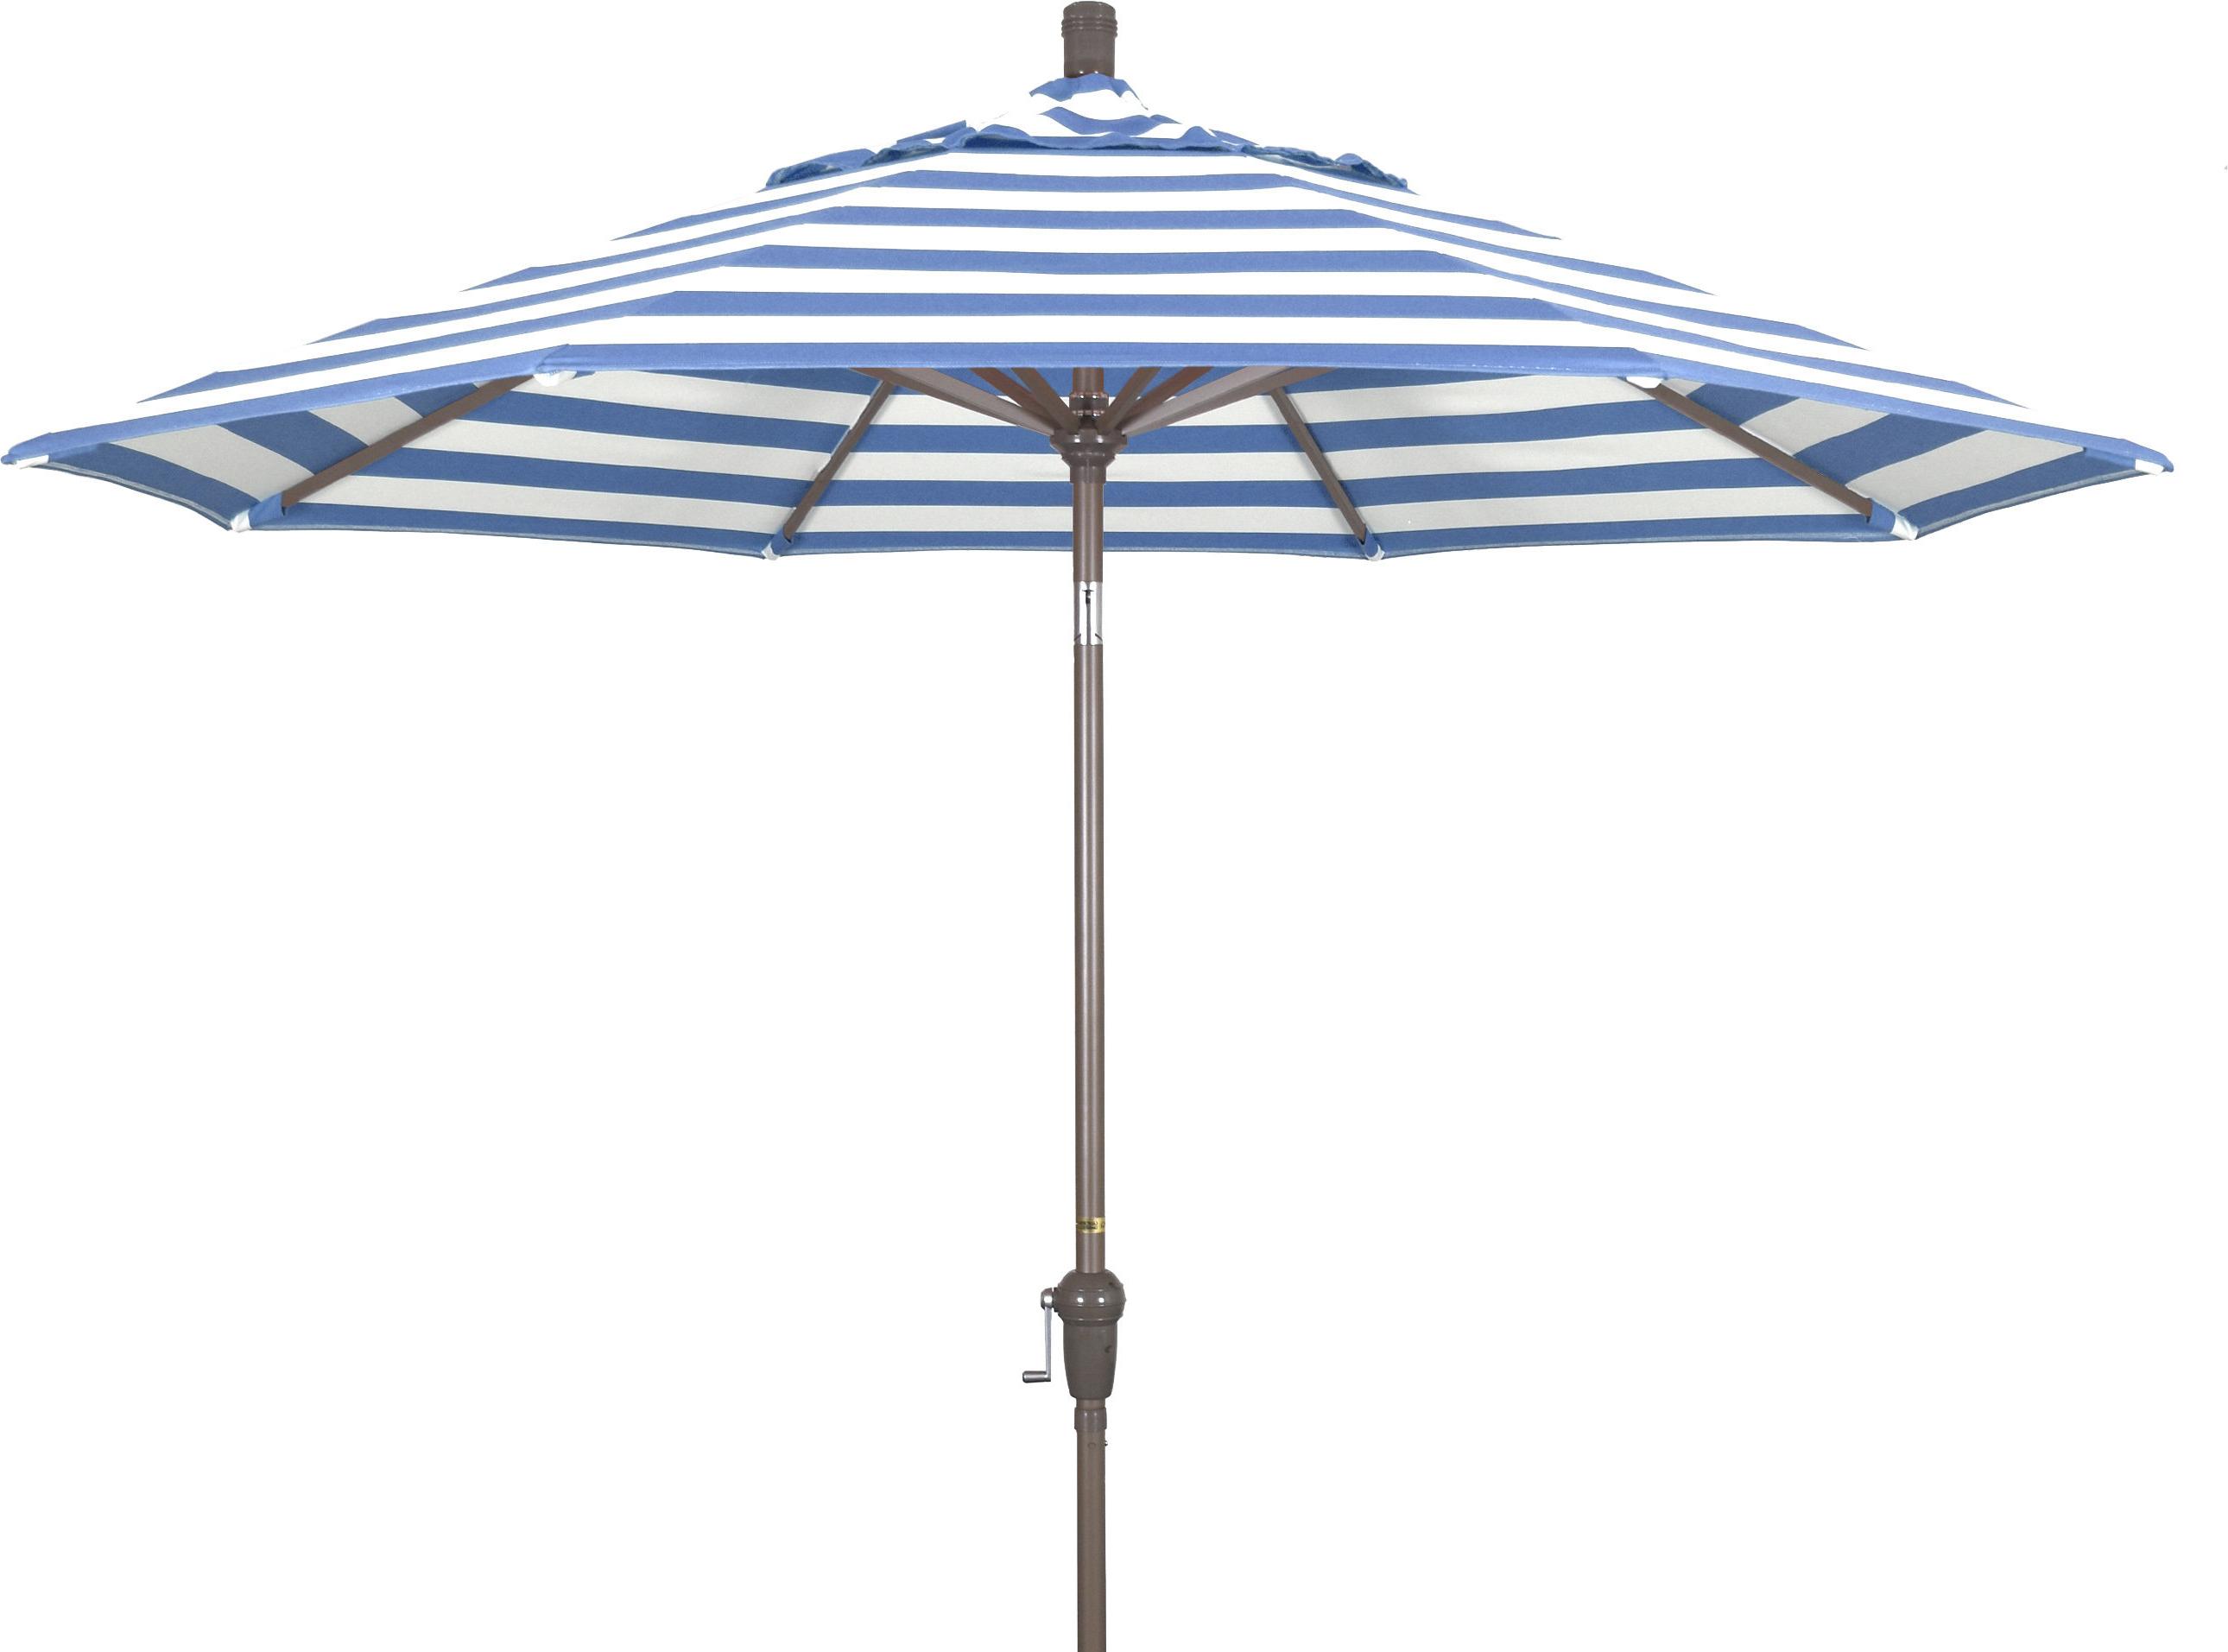 9' Market Sunbrella Umbrella Regarding Famous Wallach Market Sunbrella Umbrellas (View 2 of 20)